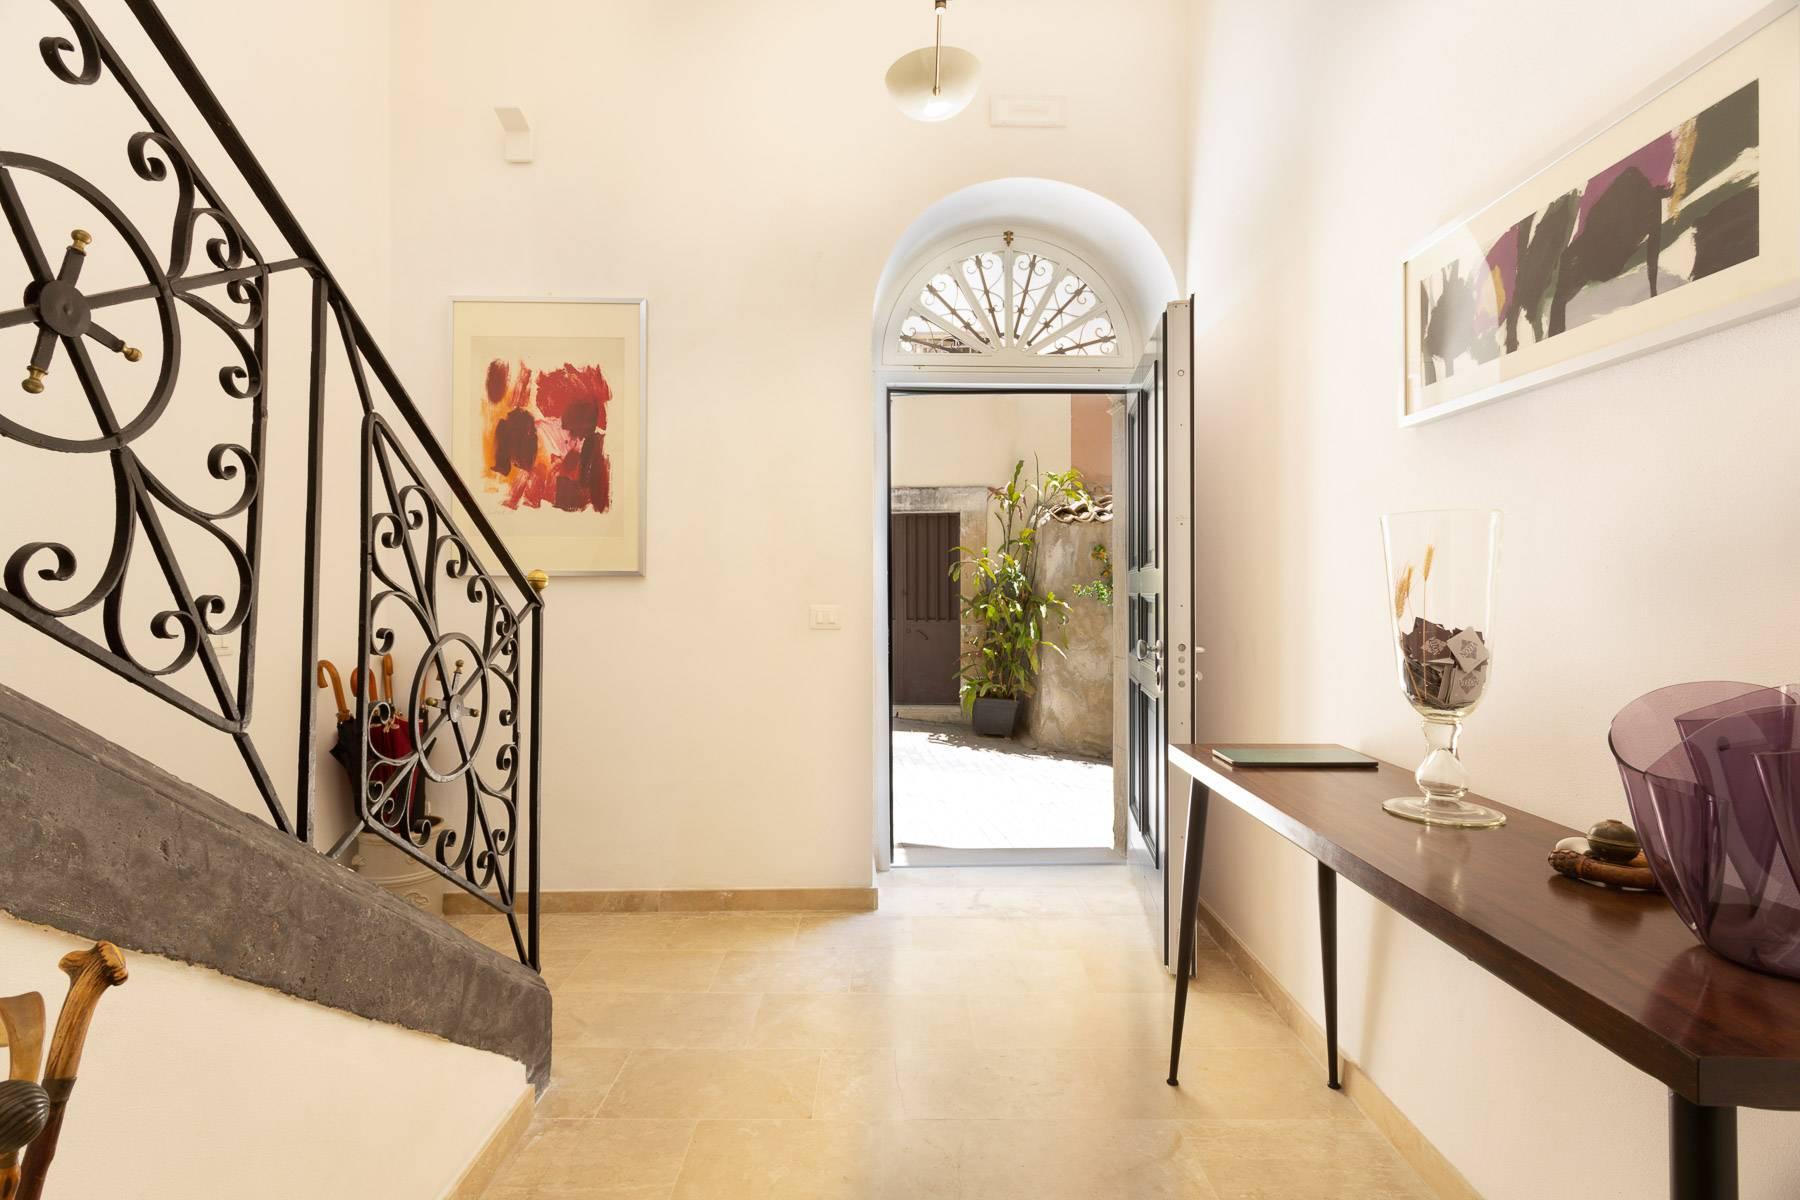 Casa indipendente in Vendita a Noto: 5 locali, 171 mq - Foto 4